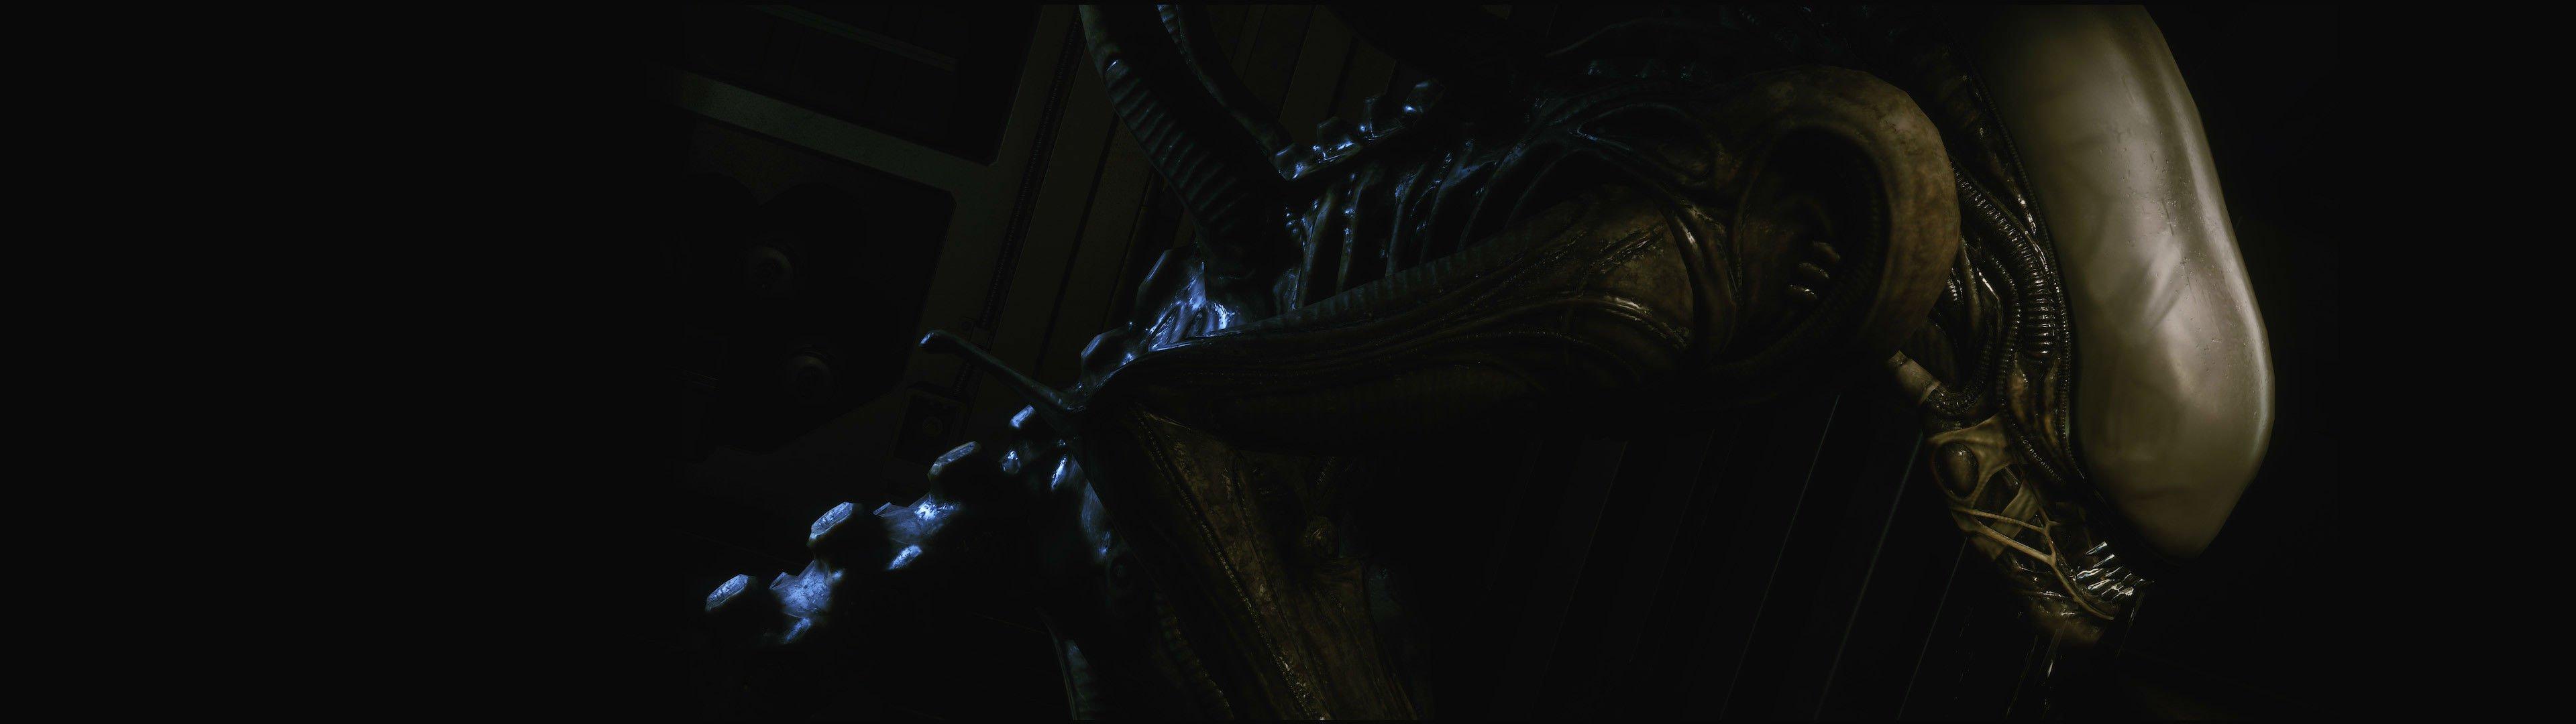 Wallpaper 3840x1080 Px Alien Aliens Creature Dark Extra Fi Futuristic Horror Monster Sci Science Terrestrial 3840x1080 Goodfon 1730443 Hd Wallpapers Wallhere